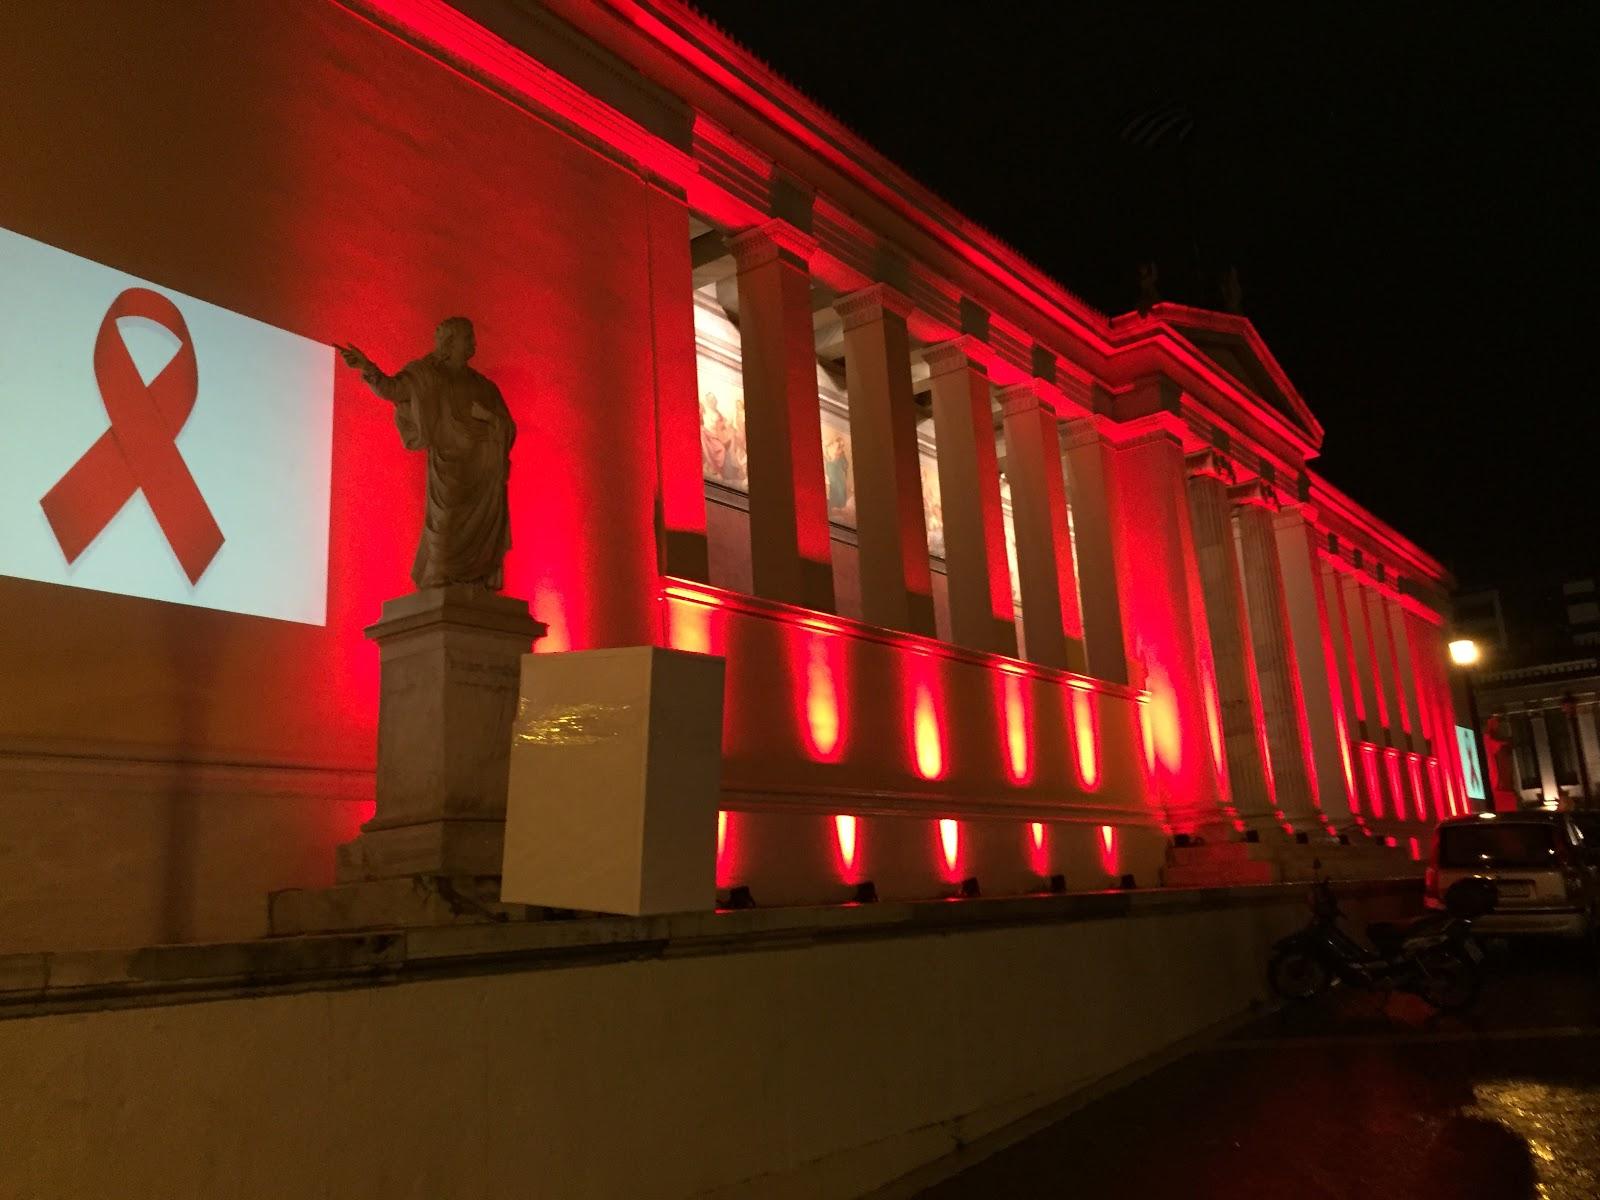 AIDS: Μειώθηκε κατά 6,7% το κόστος διαχείρισης στην Ελλάδα